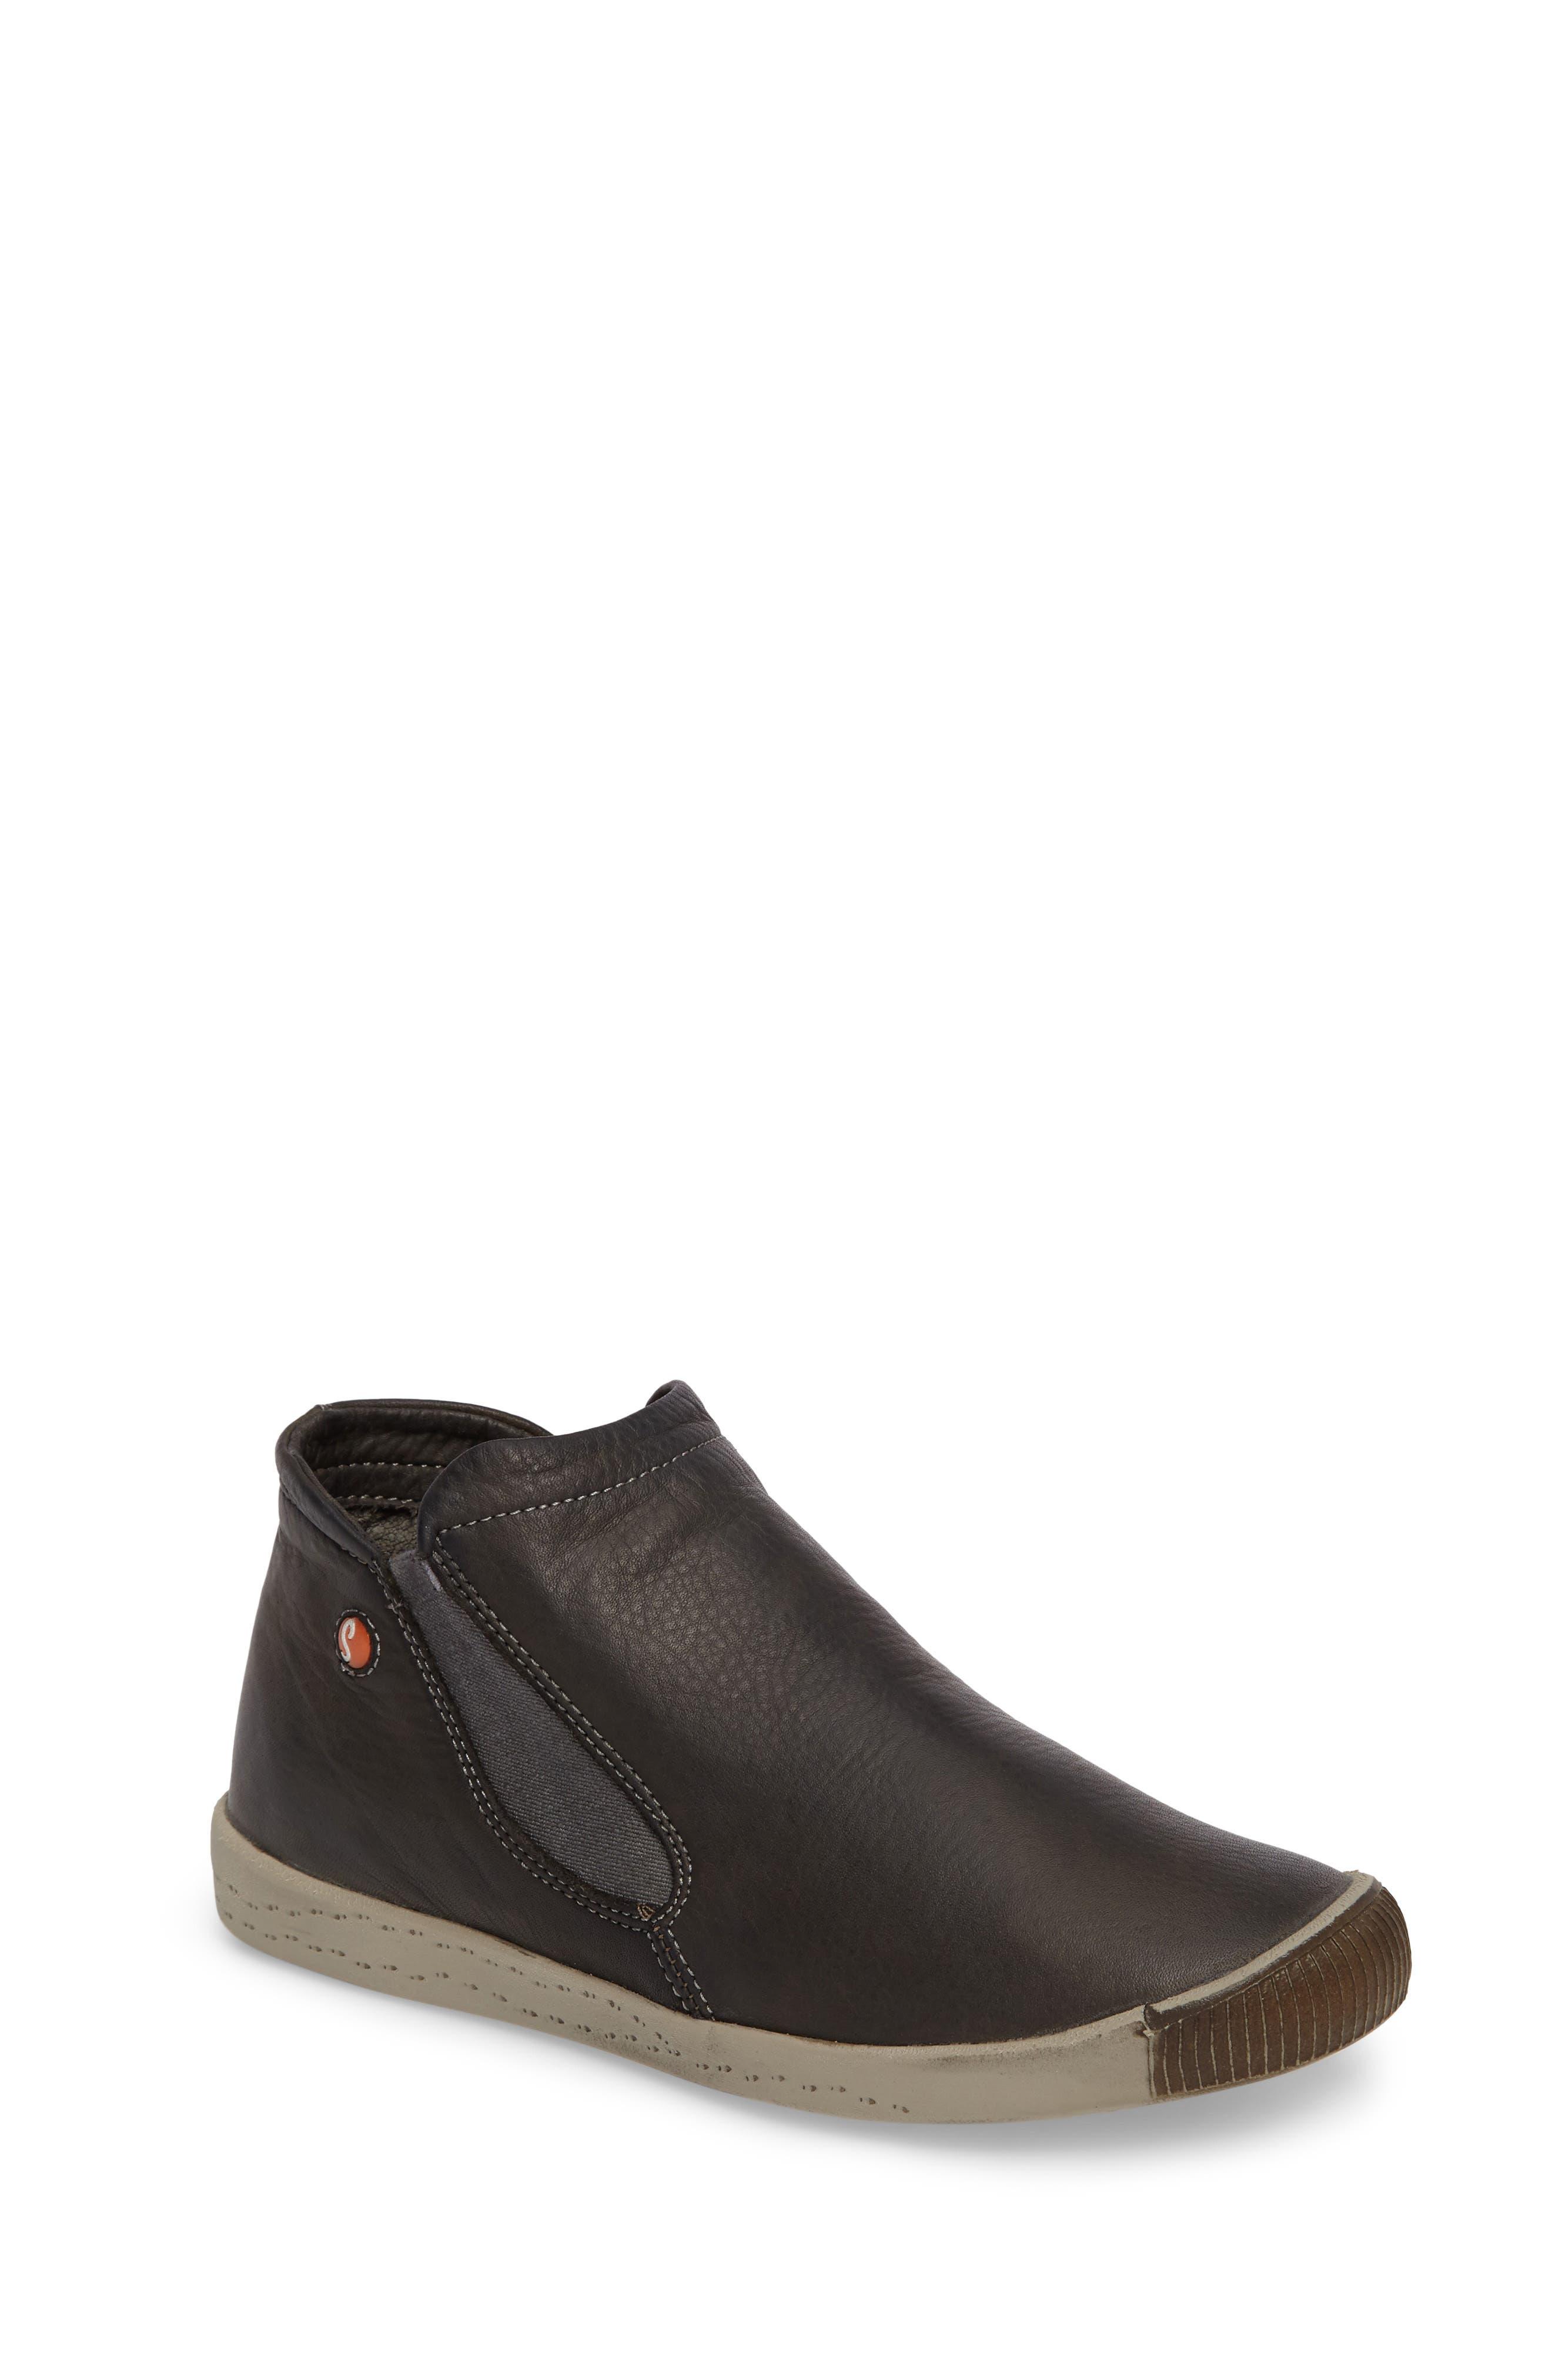 Inge Slip-On Sneaker,                         Main,                         color, Military Leather